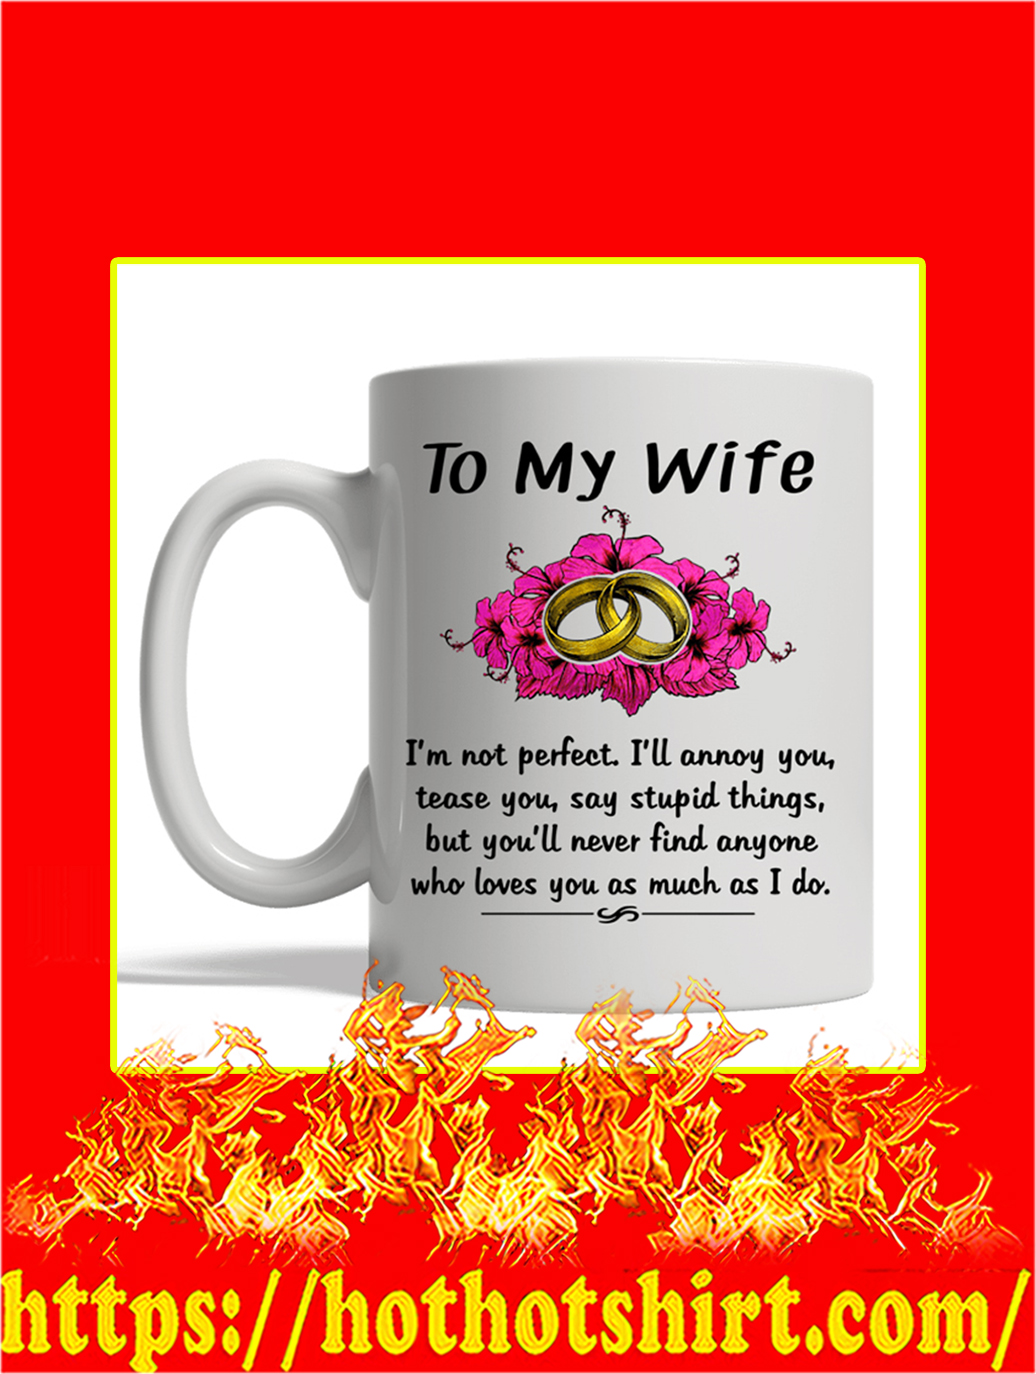 To My Wife I'm Not Perfect Mug- white mug